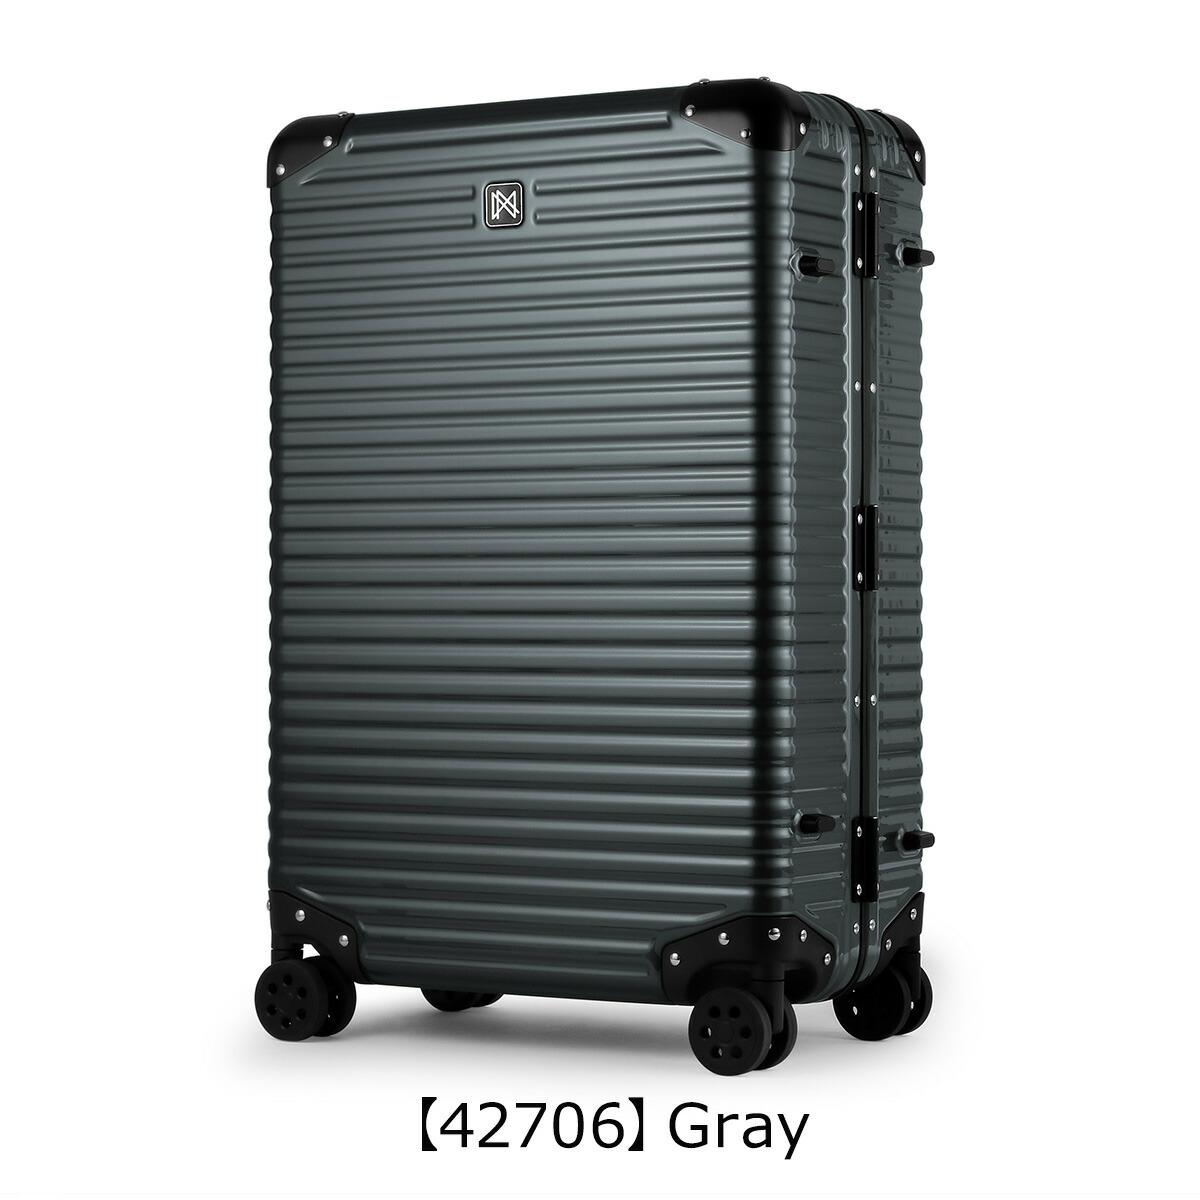 【42706】Gray